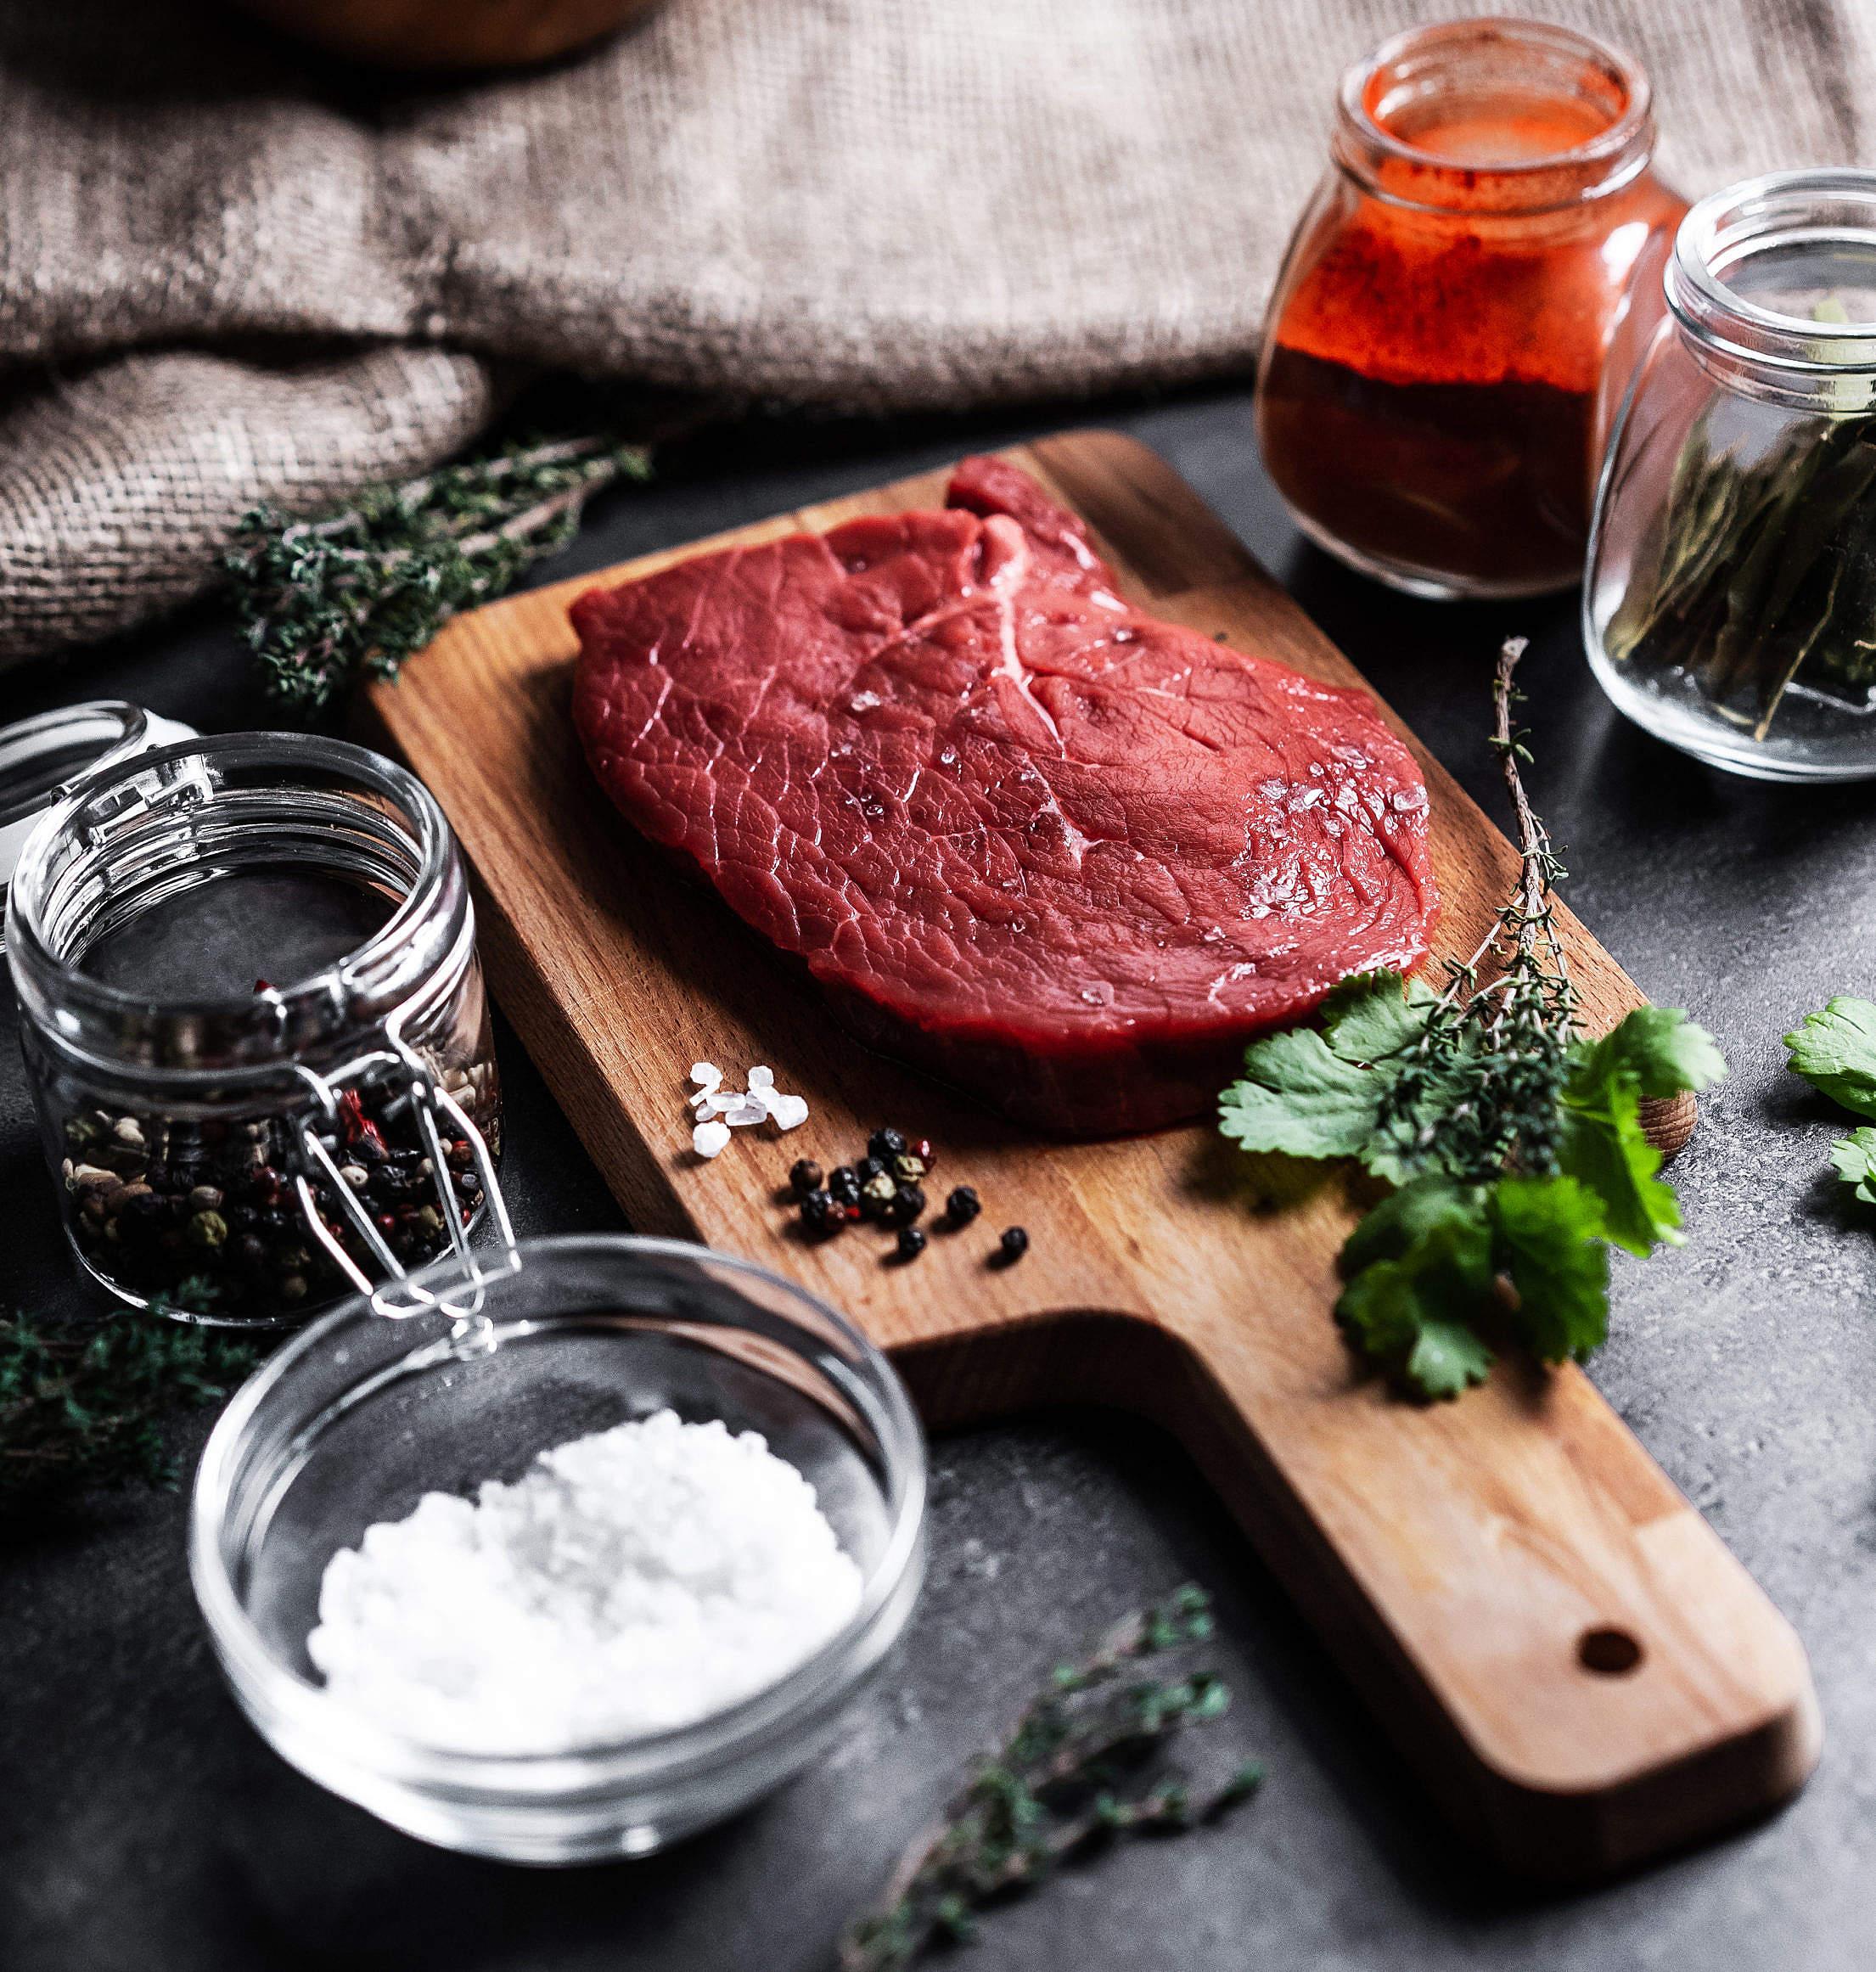 Preparing Beef Steak Close Up Free Stock Photo